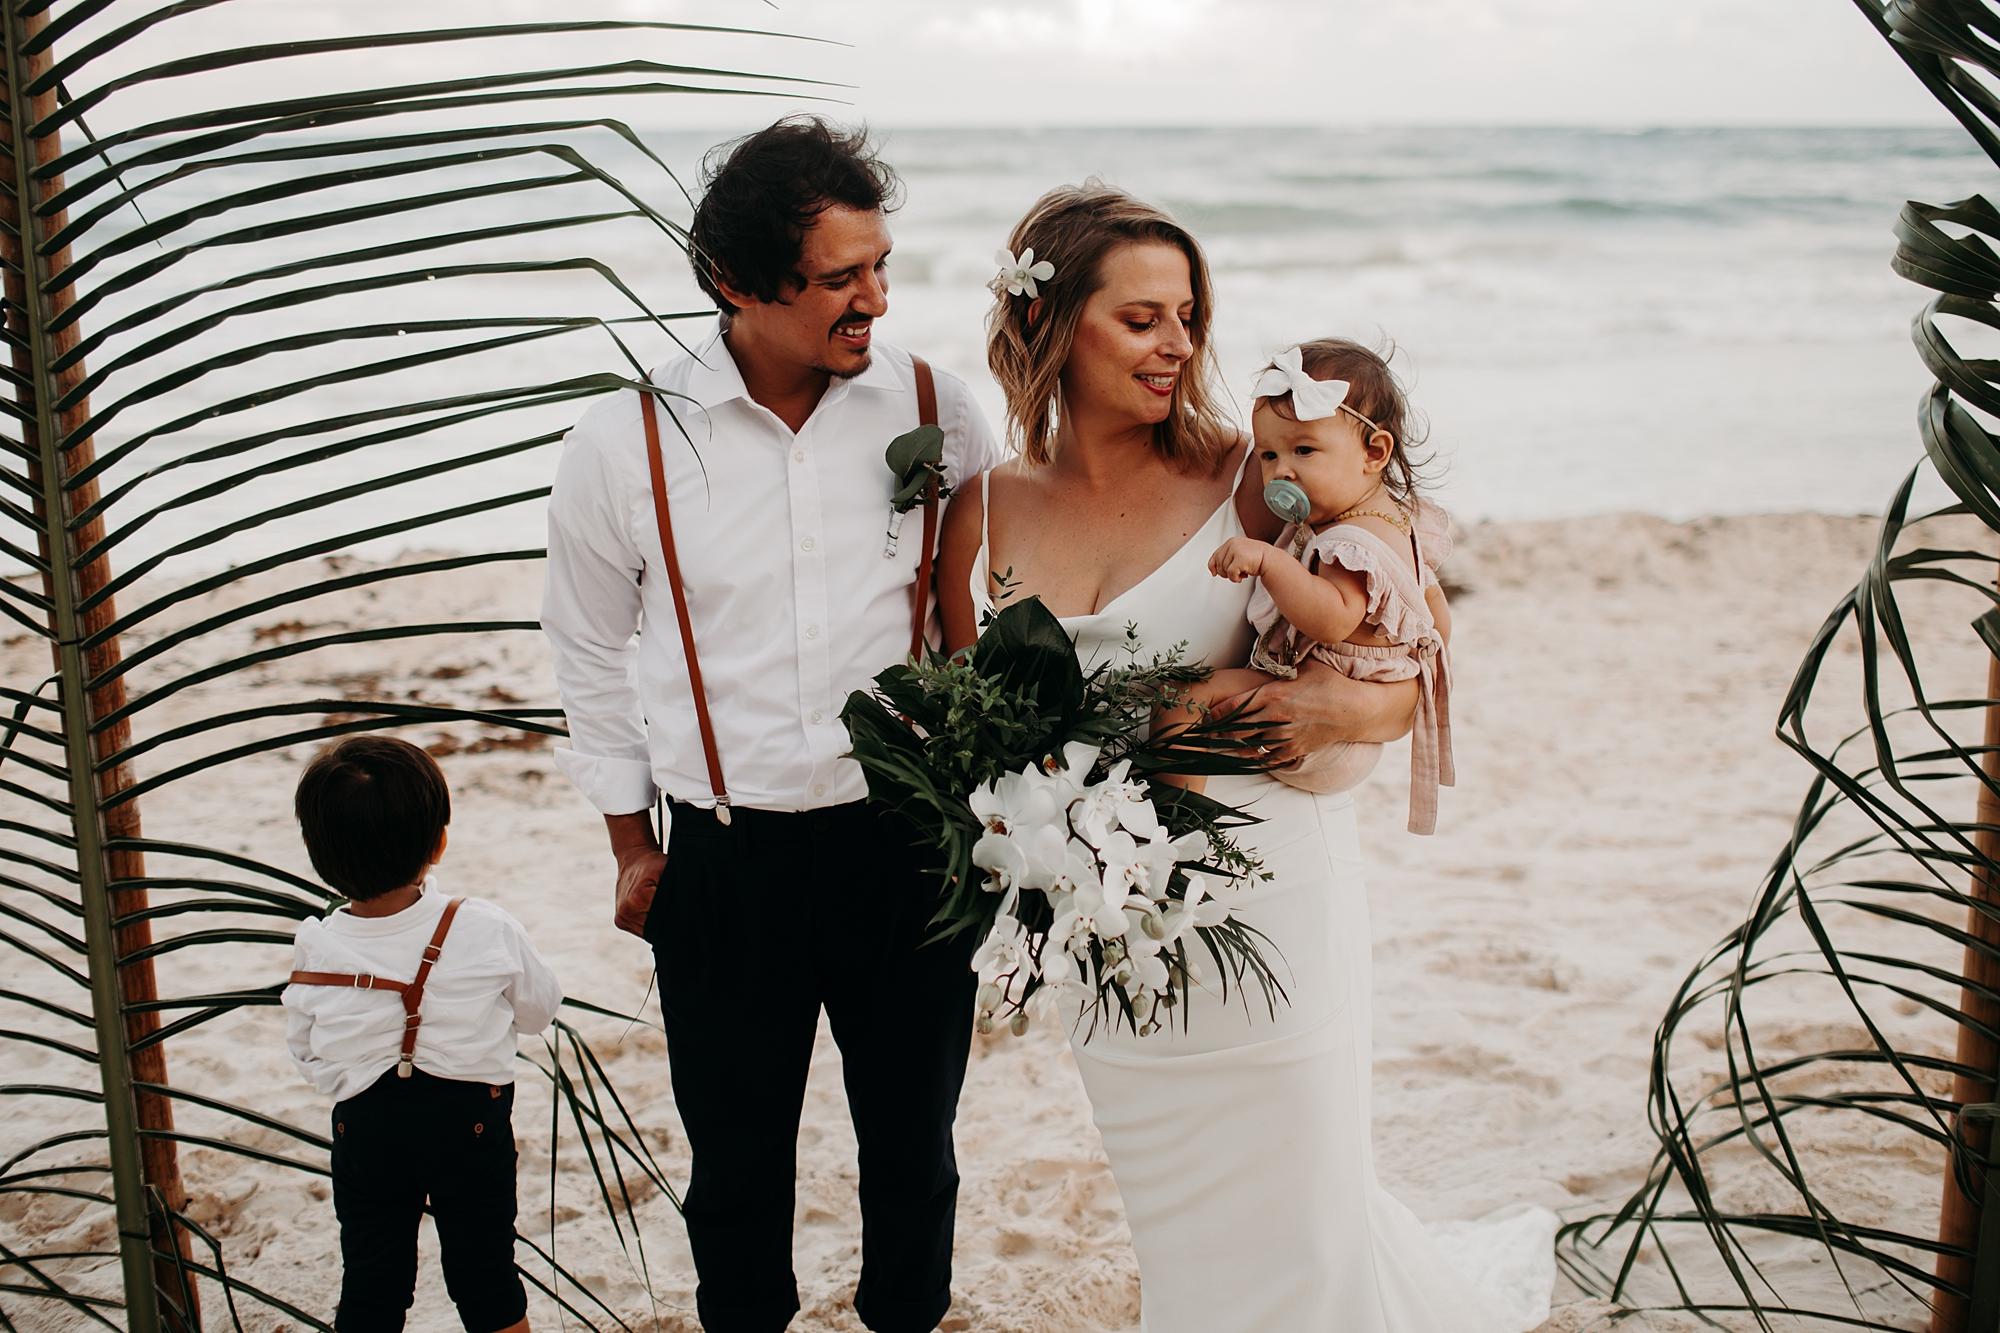 Danielle-San-Antonio-Wedding-Photographer-206_WEB.jpg